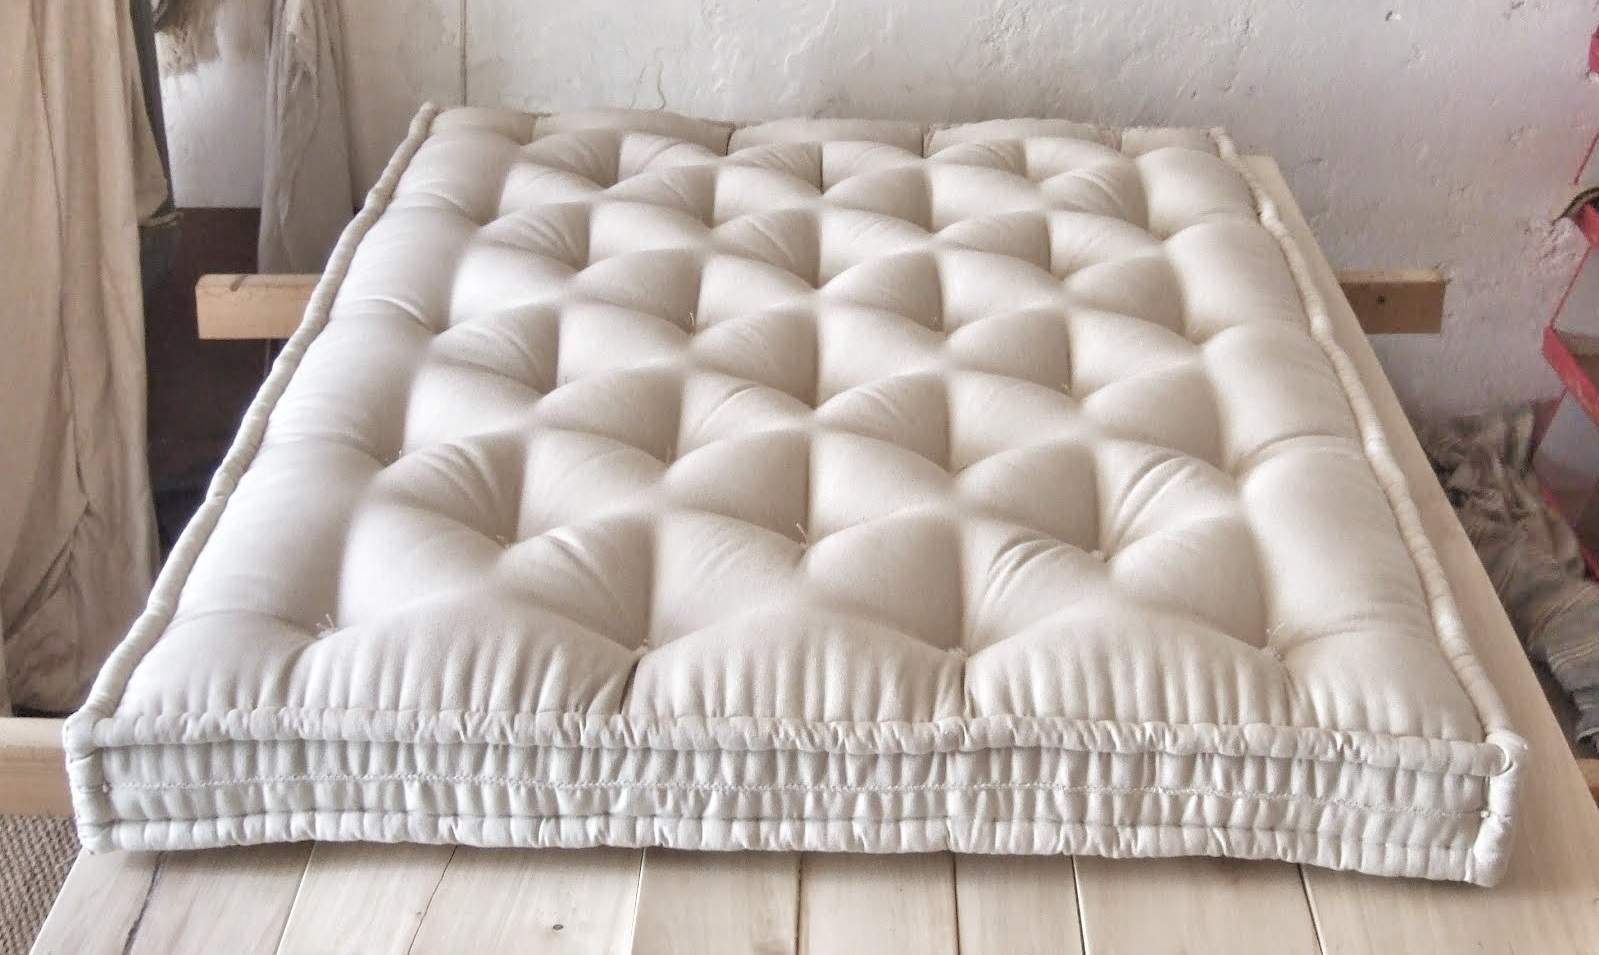 literie bio matelas conseils. Black Bedroom Furniture Sets. Home Design Ideas